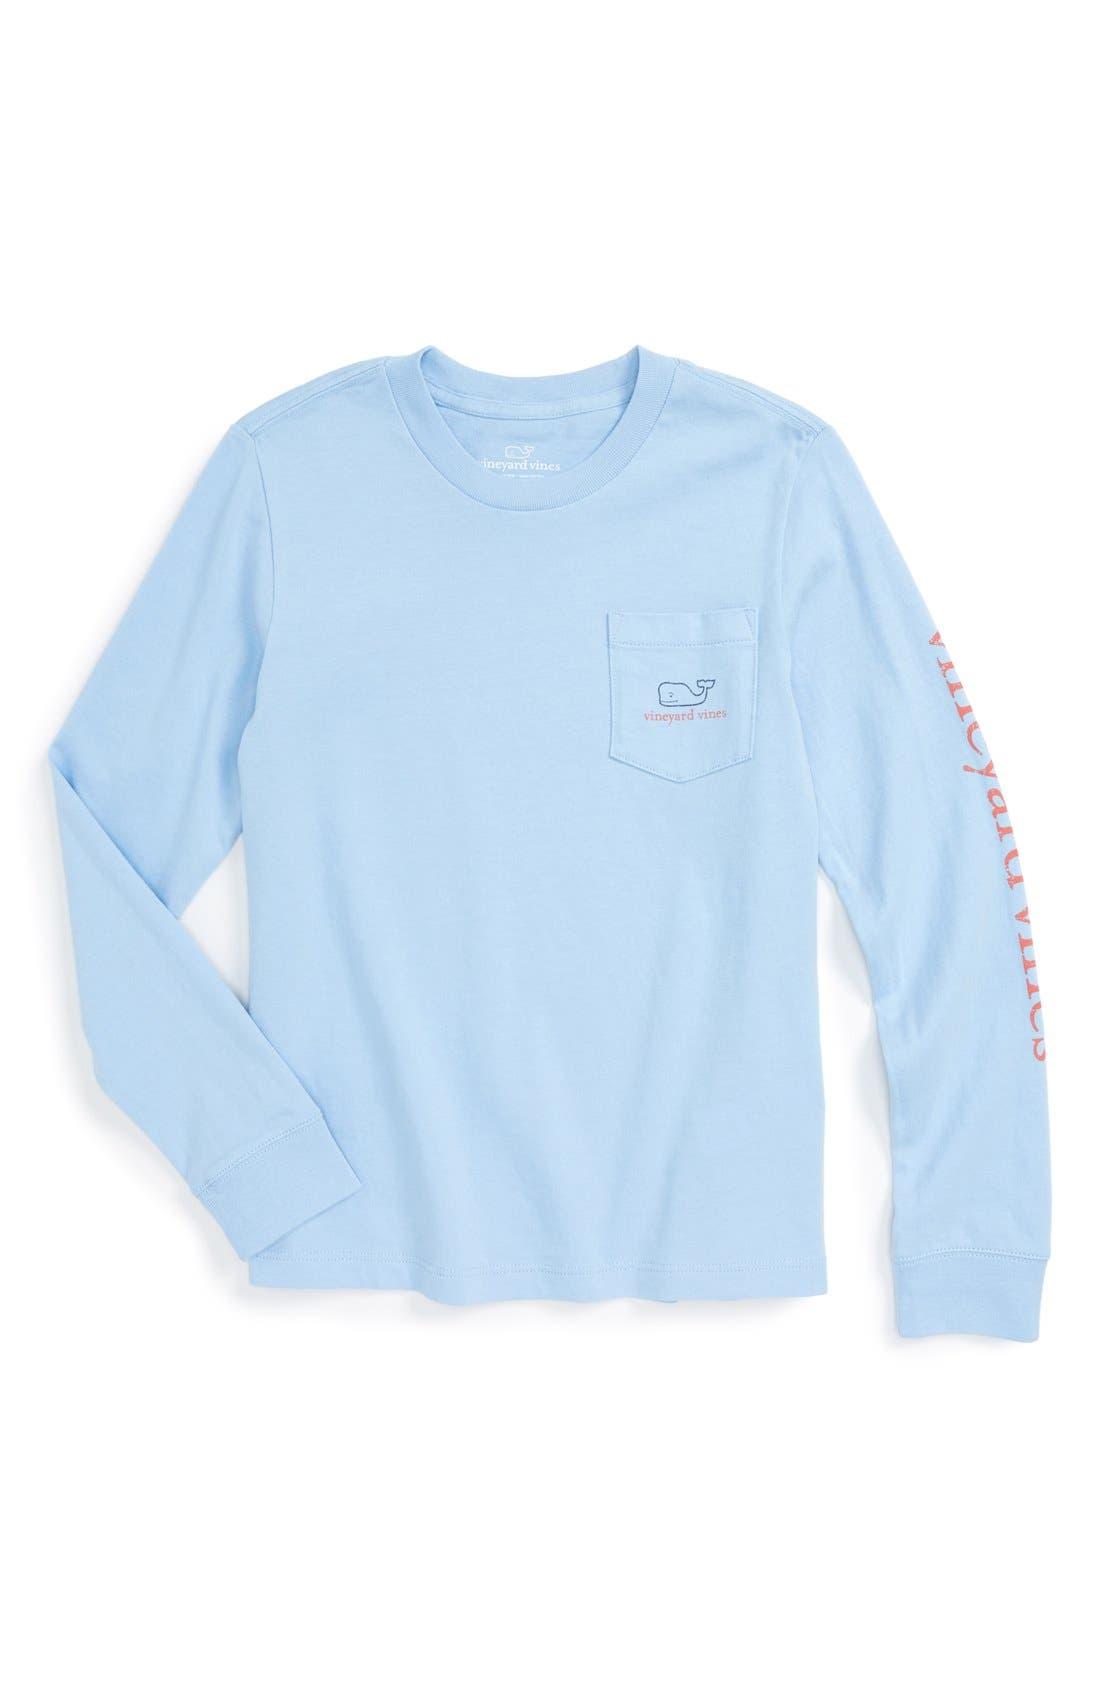 Alternate Image 1 Selected - vineyard vines Vintage Whale Long Sleeve Pocket T-Shirt (Toddler Boys, Little Boys & Big Boys)